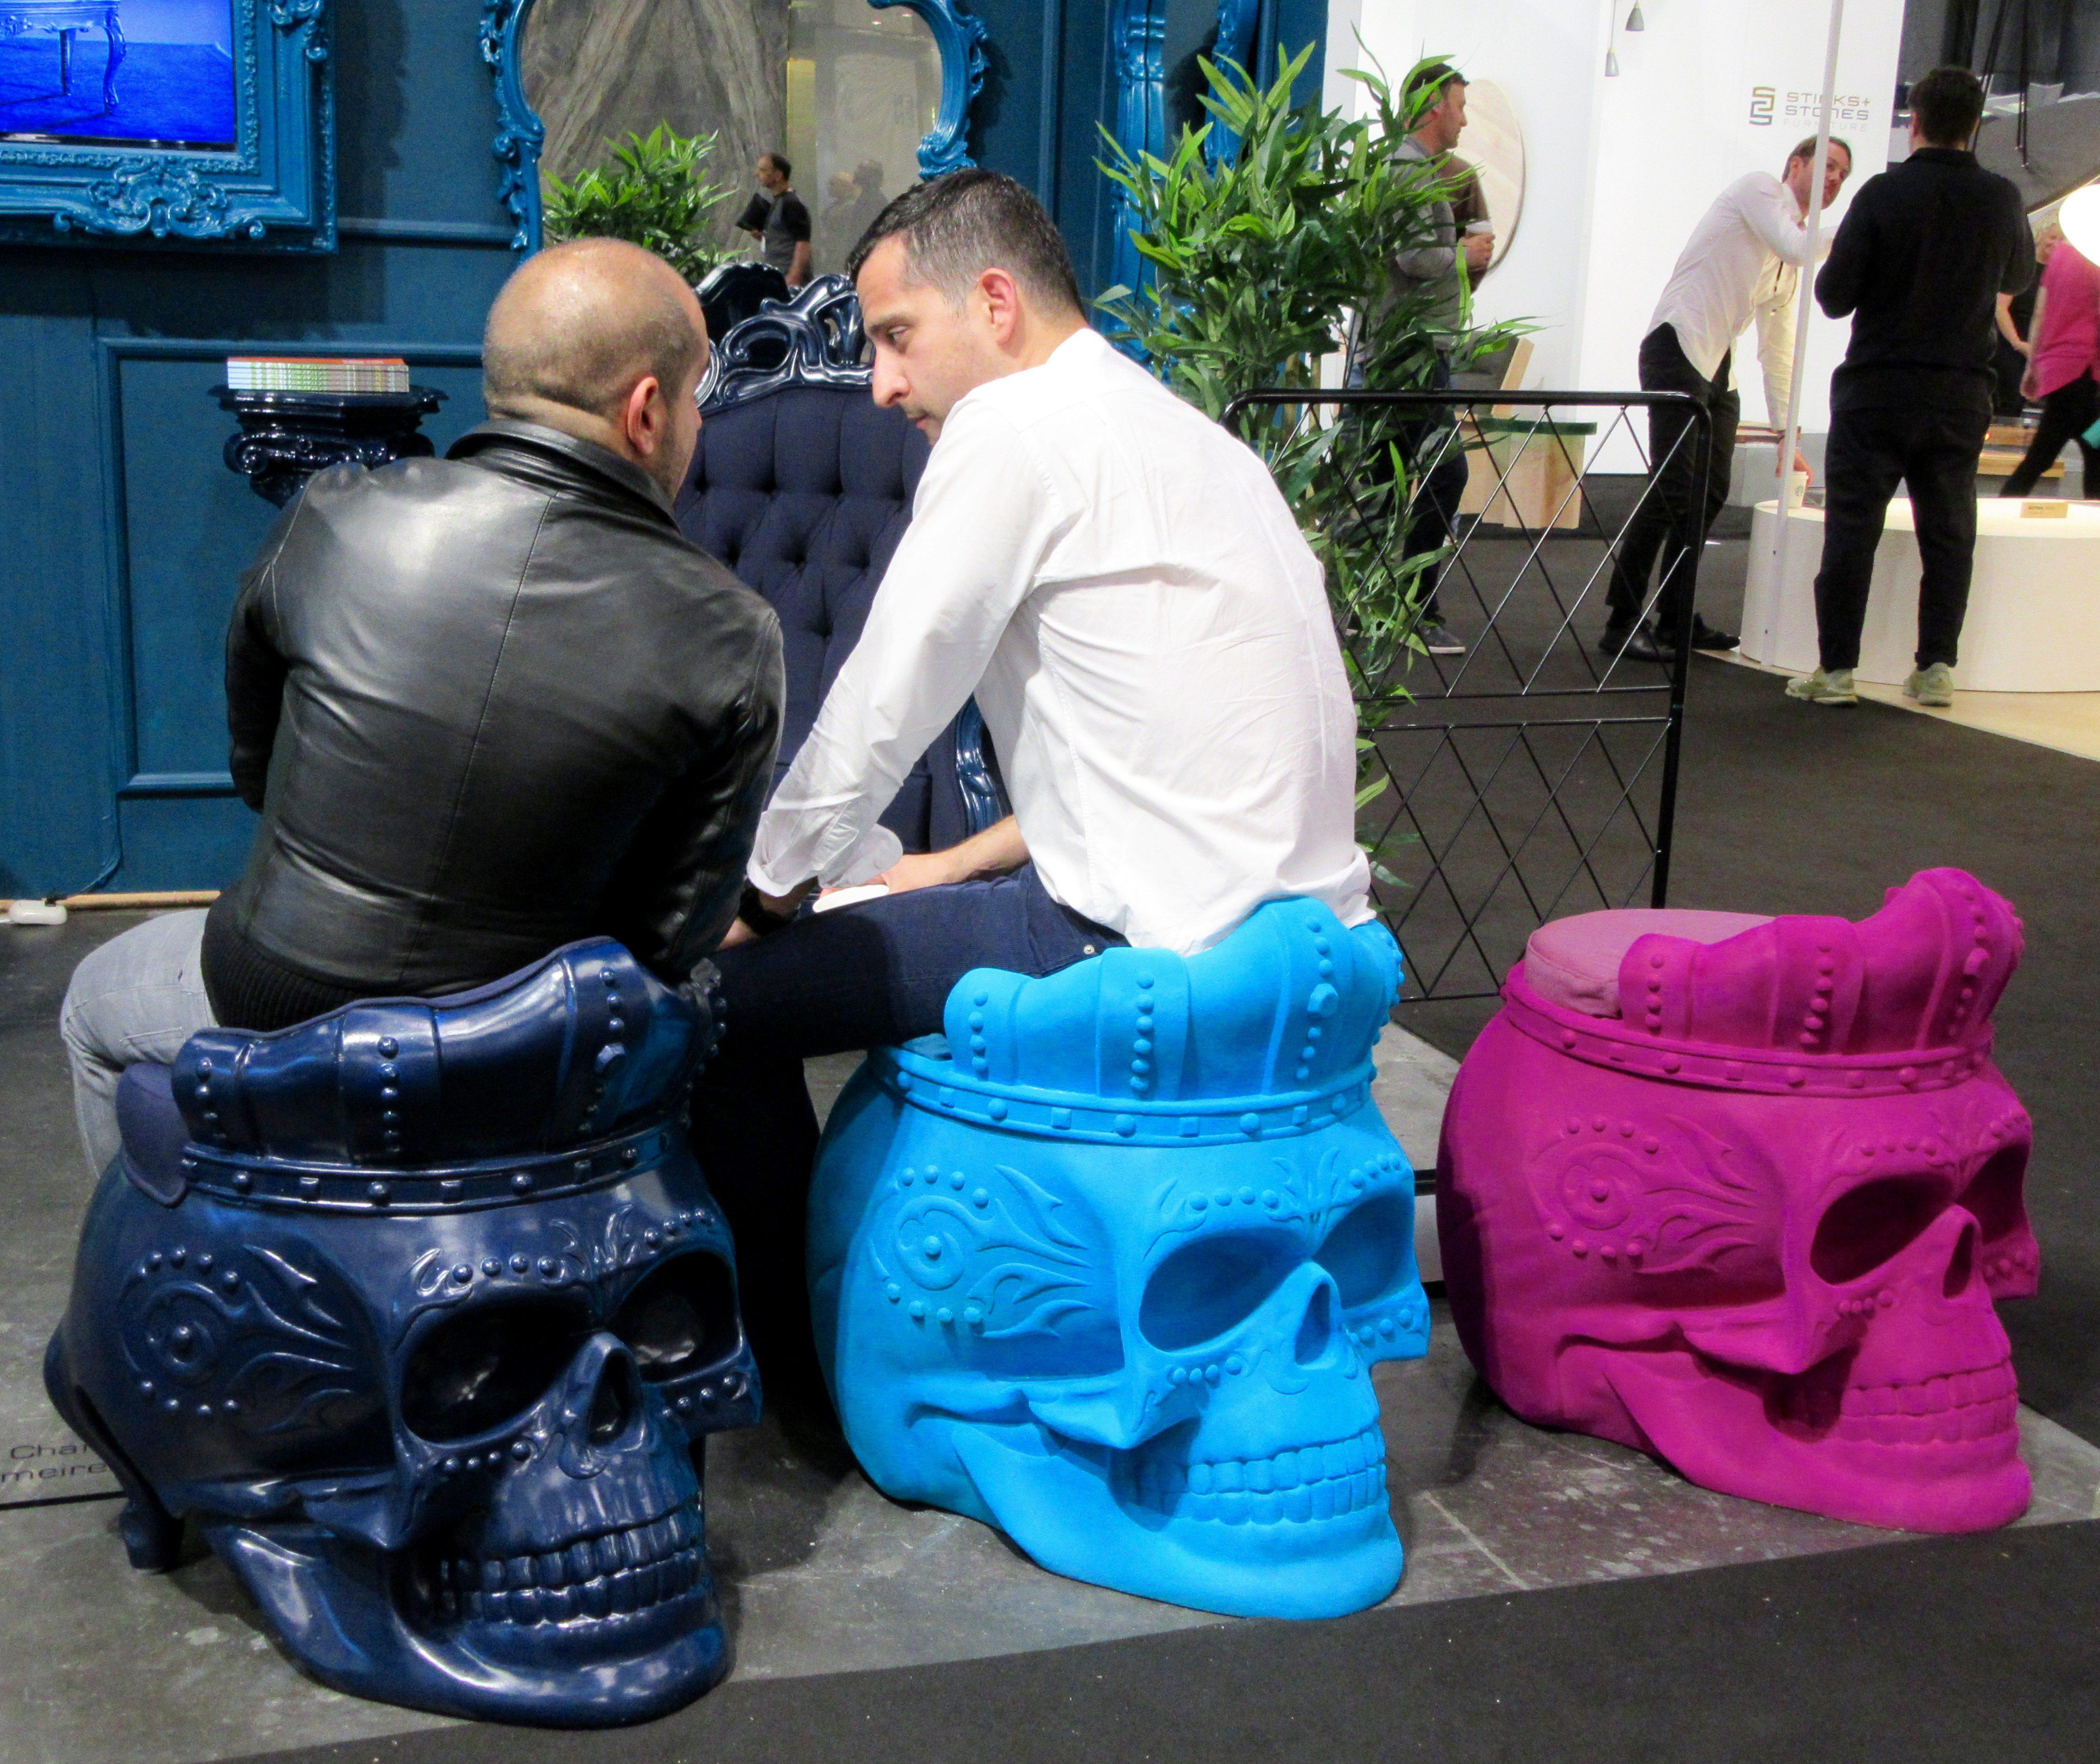 Furniture The Worley Gig